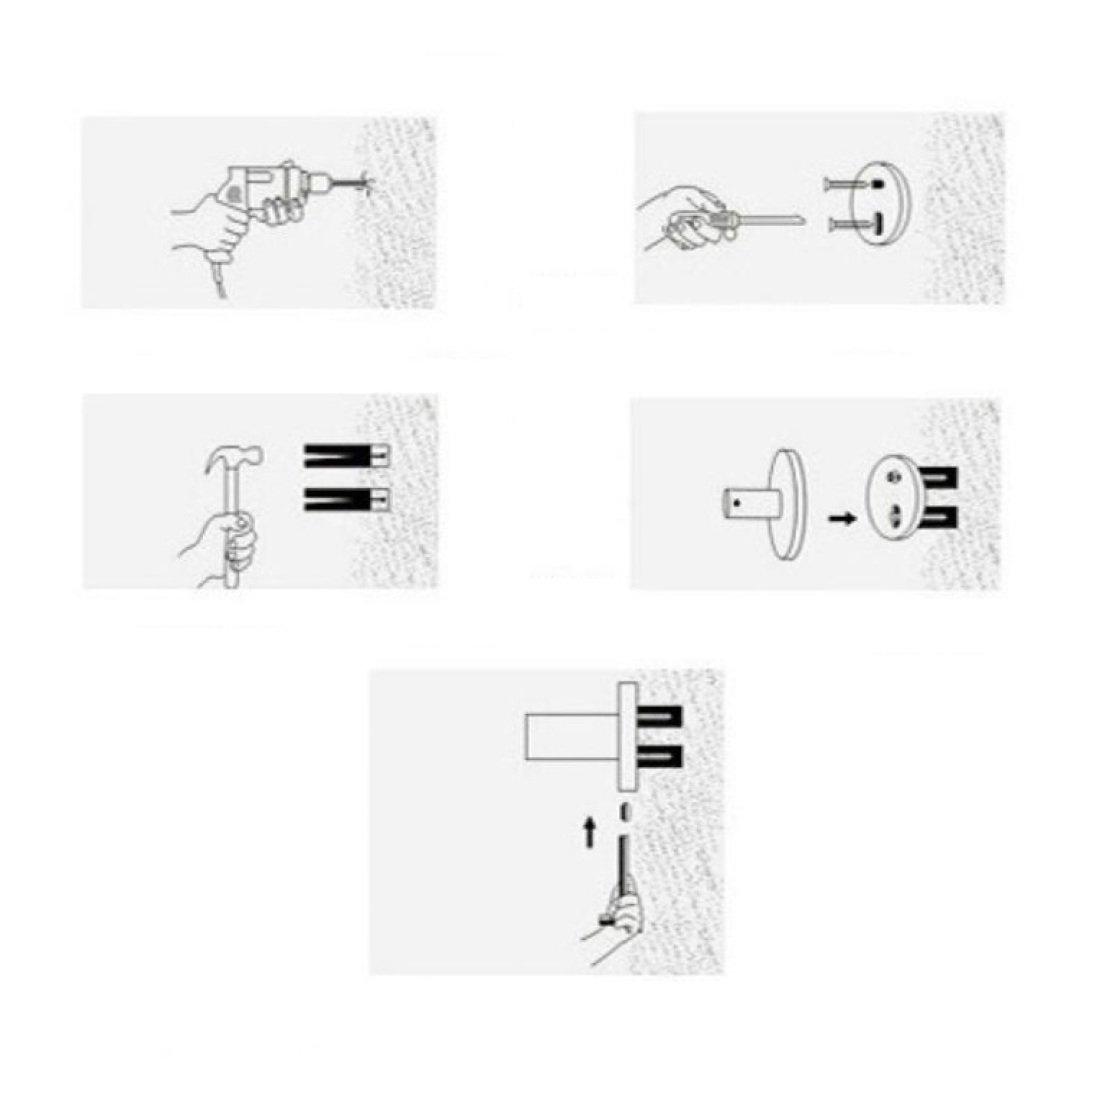 GL&G European luxury Rose gold Bathroom Bath Towel Rack Double Towel Bar Space aluminum Bathroom Storage & Organization Bathroom Shelf Shower Wall Mount Holder Towel Bars,6023.513.5cm by GAOLIGUO (Image #6)